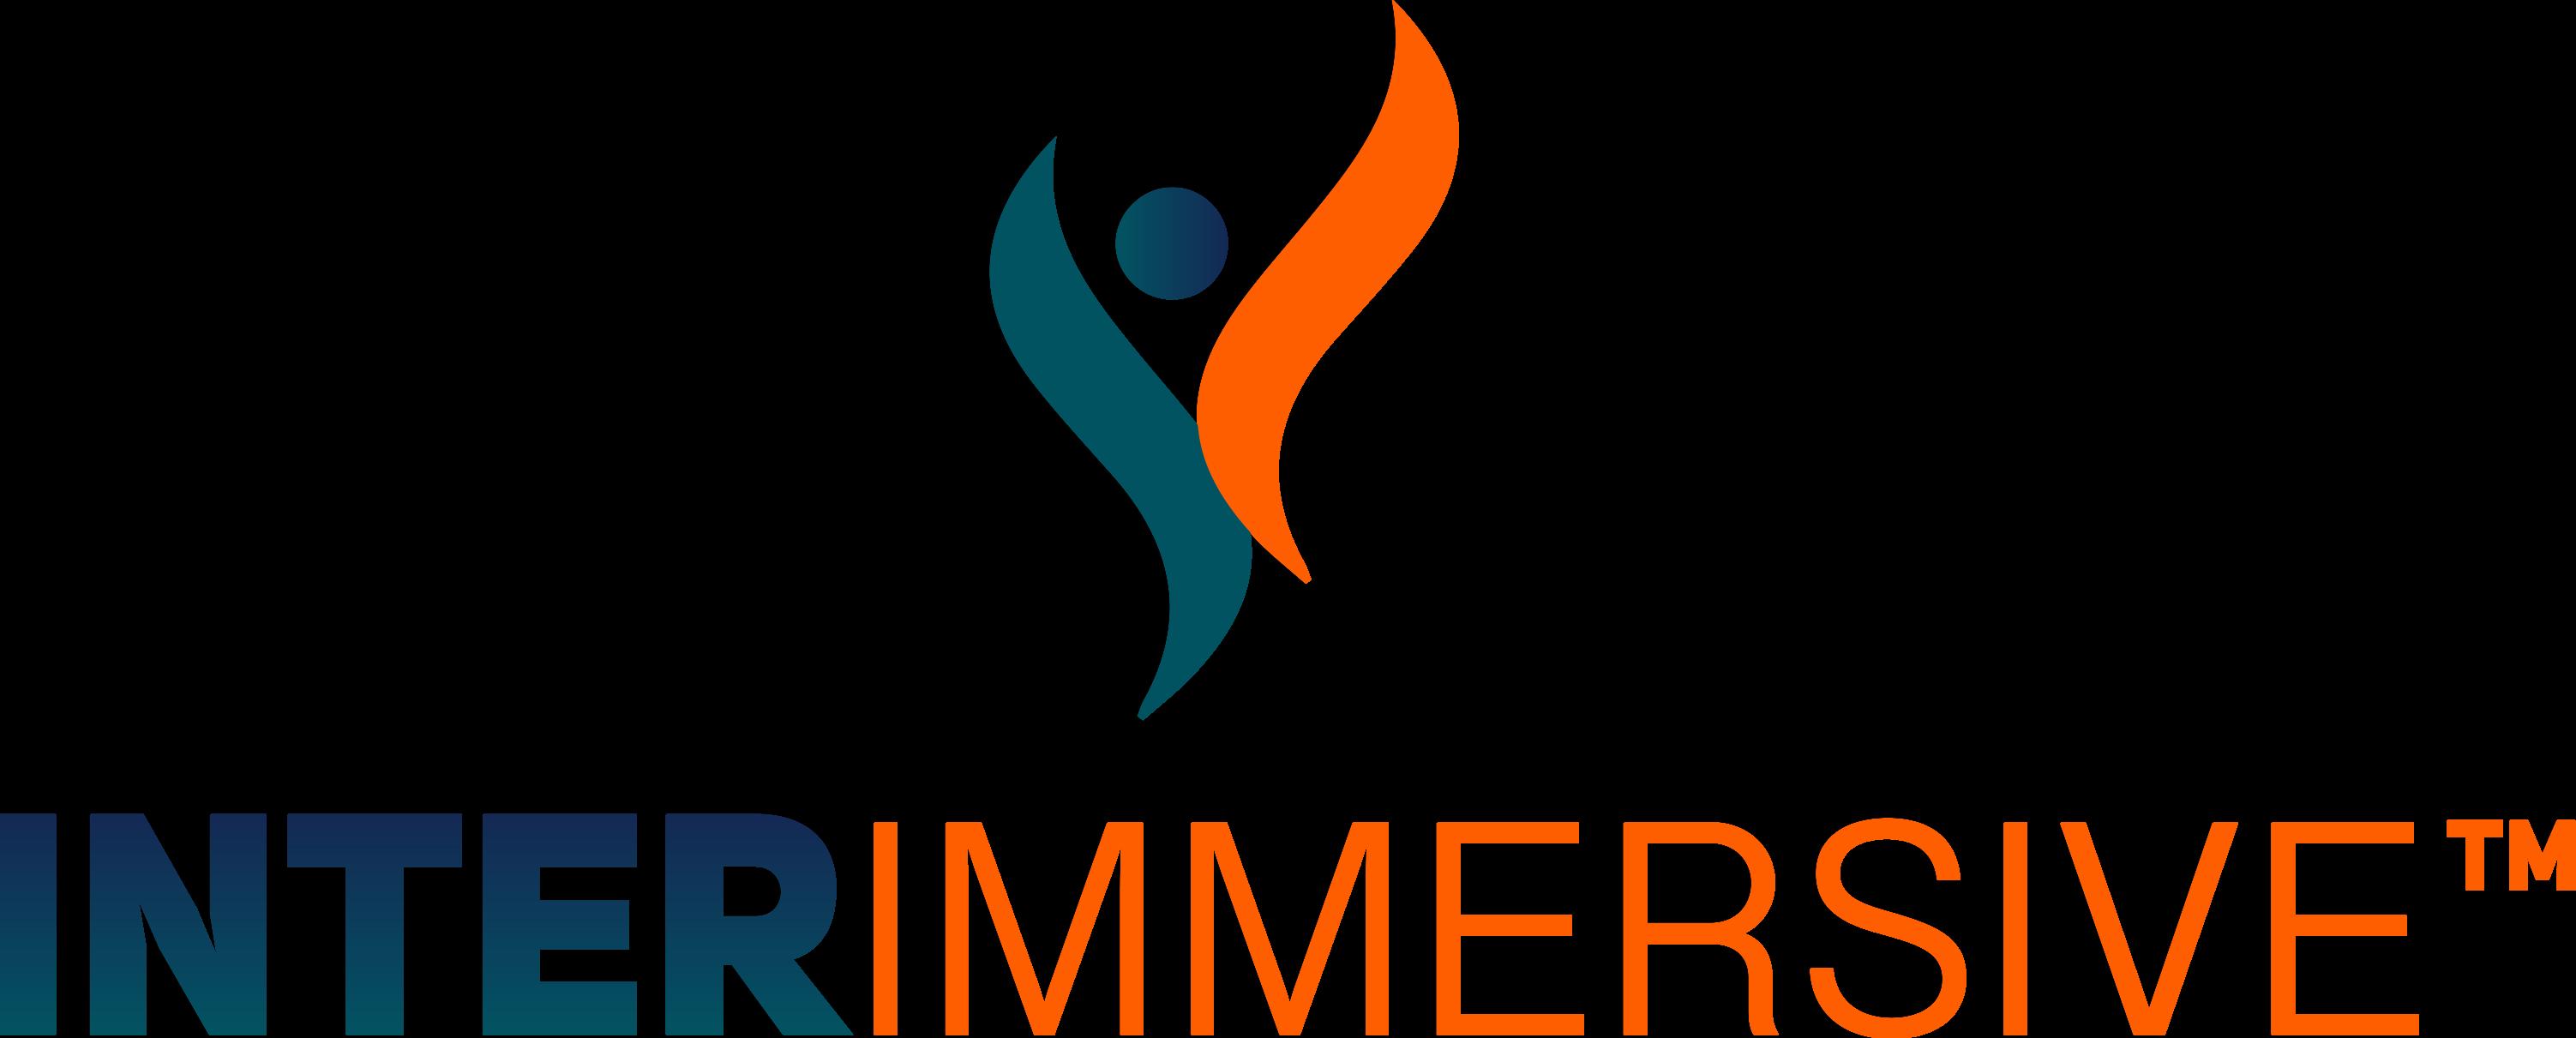 Interimmersive™ LLC